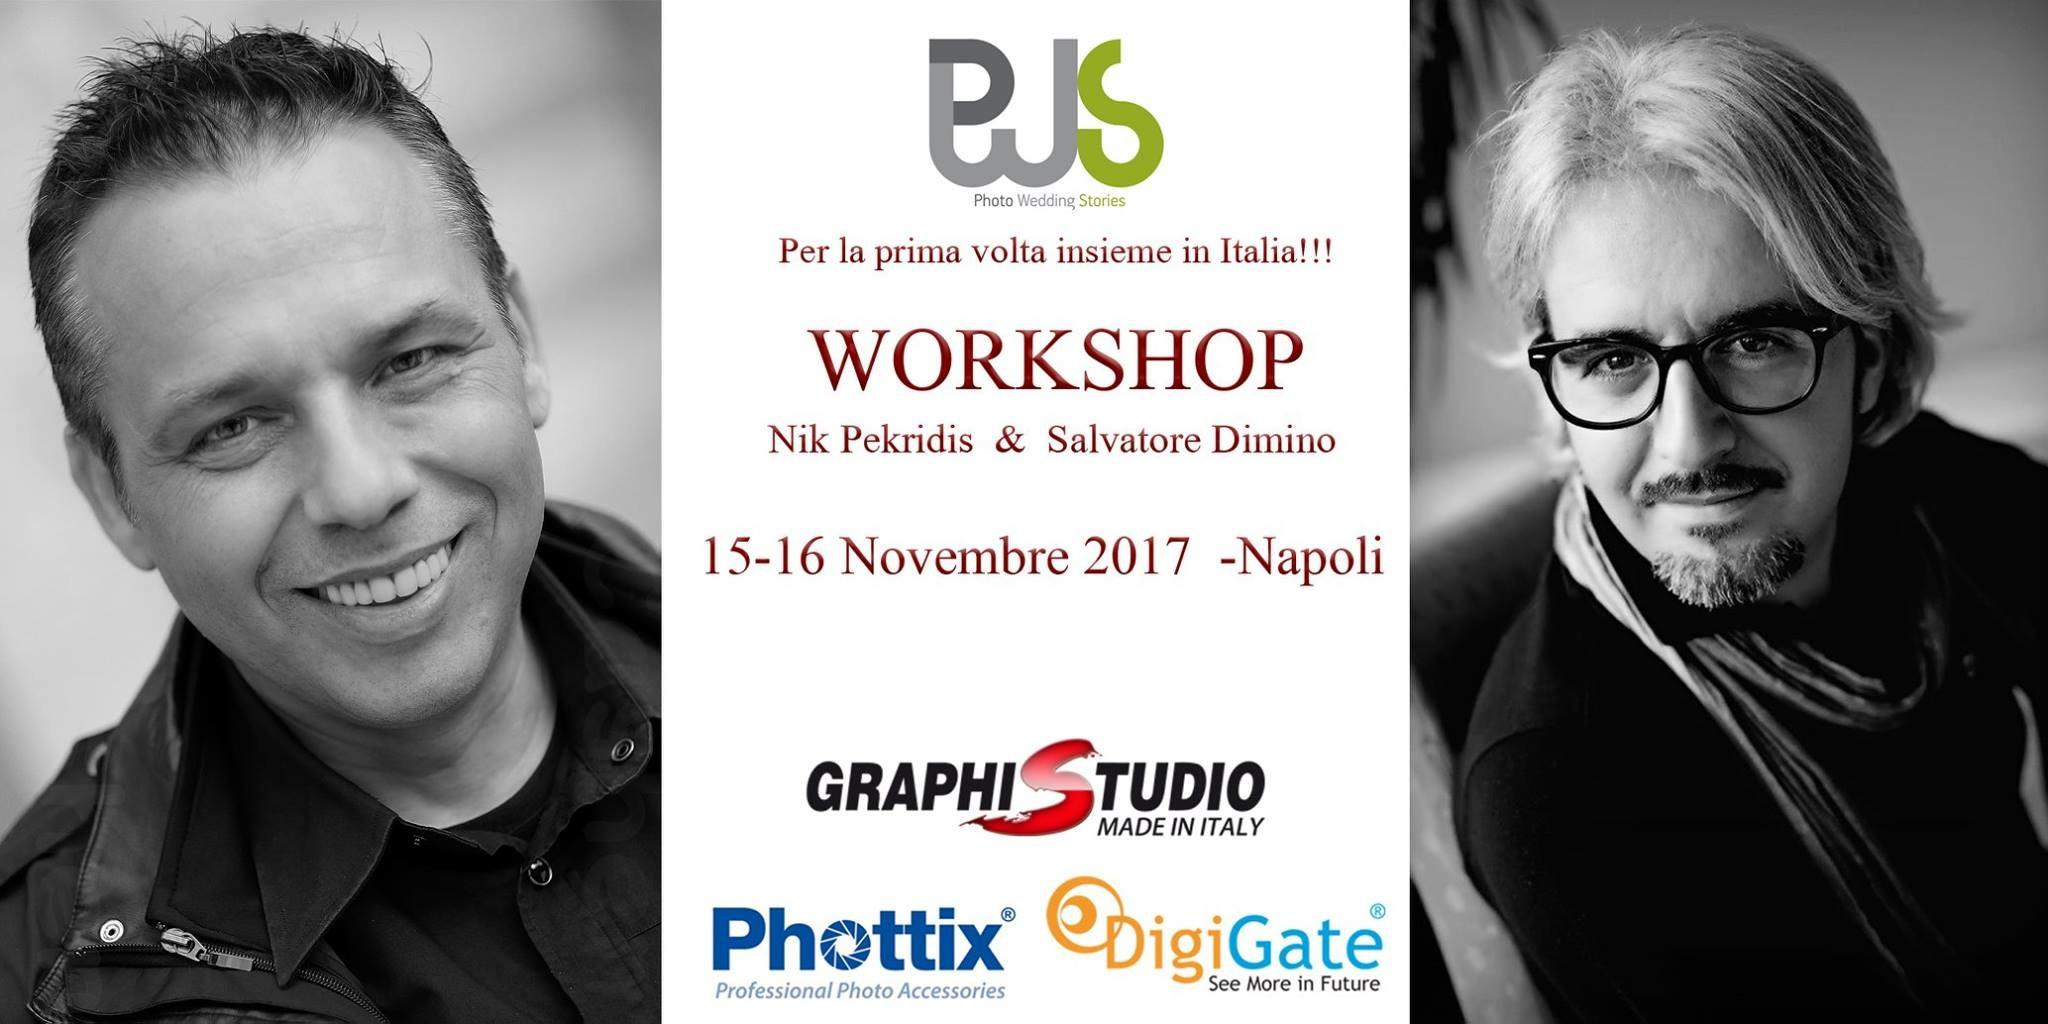 Salvatore Dimino & Nik Pekridis in Napoli